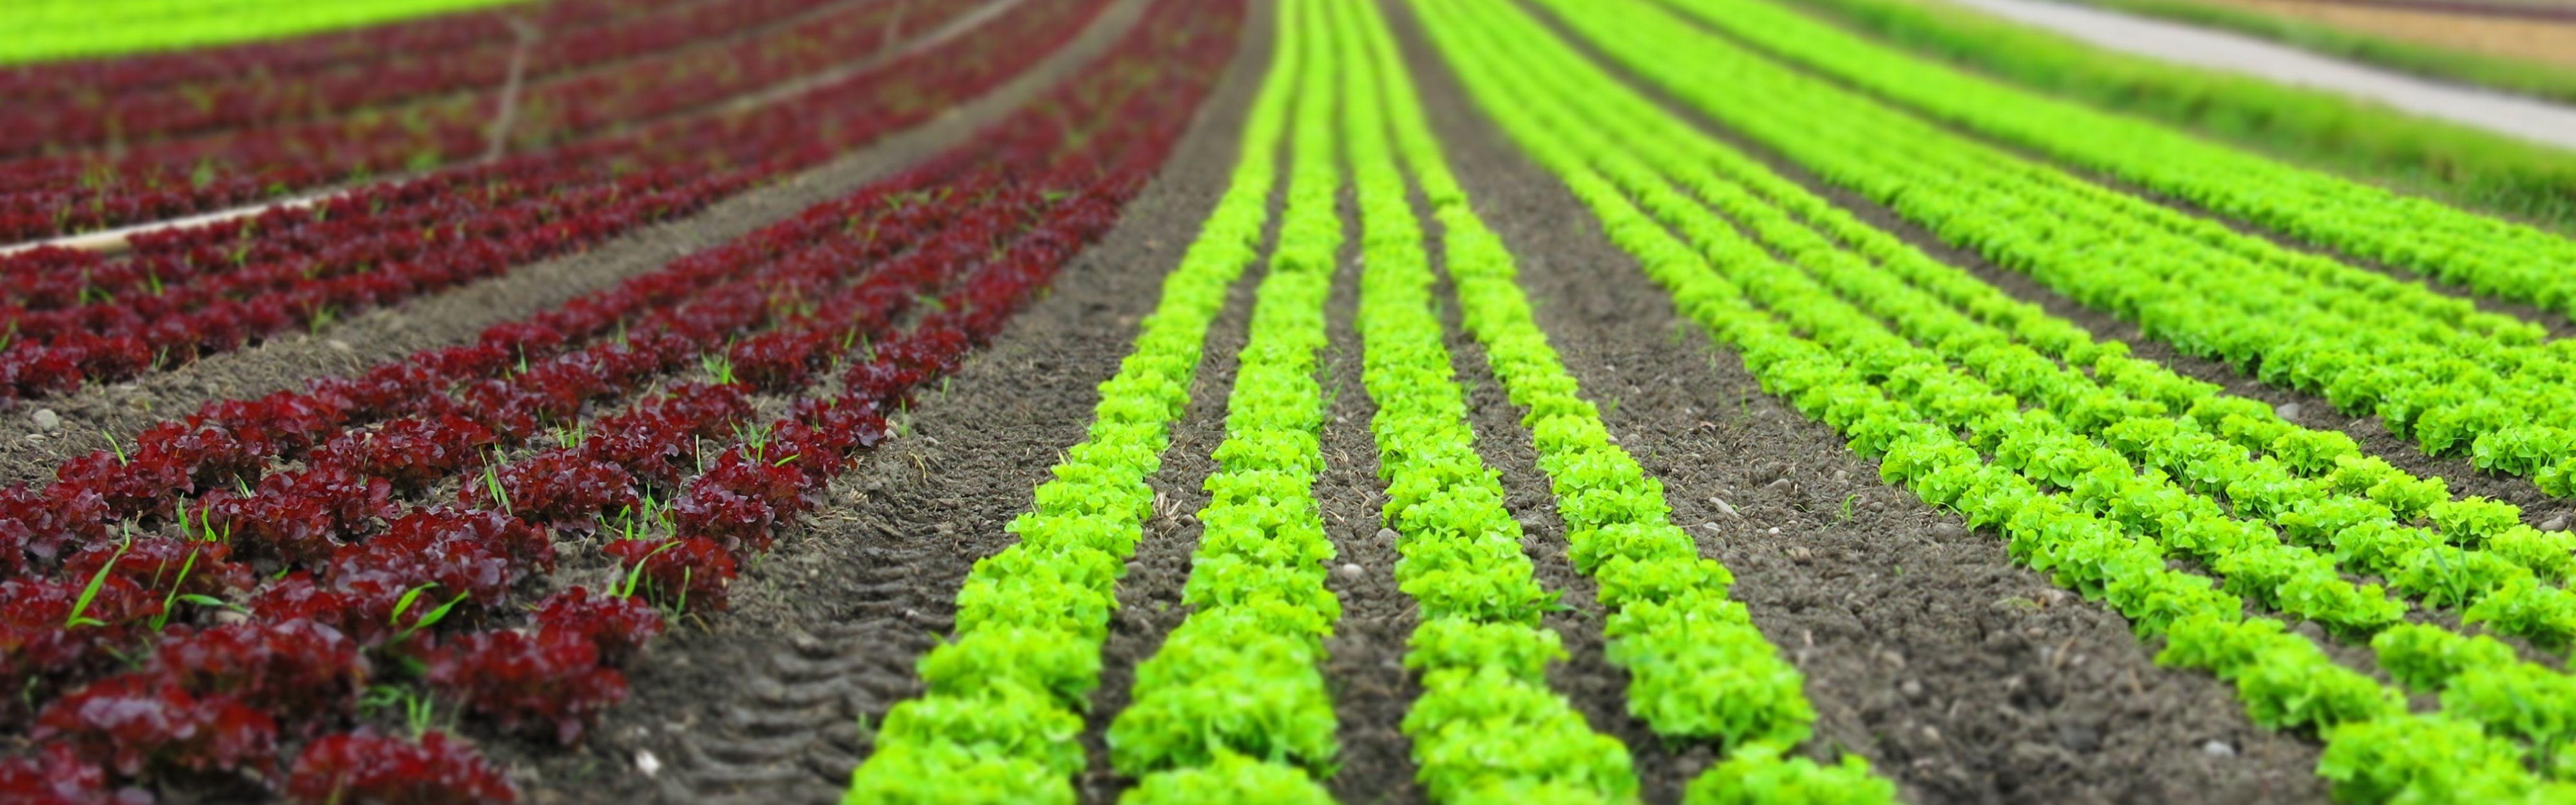 salatfeld streifen grün rot feld gemüsebau landwirtschaft